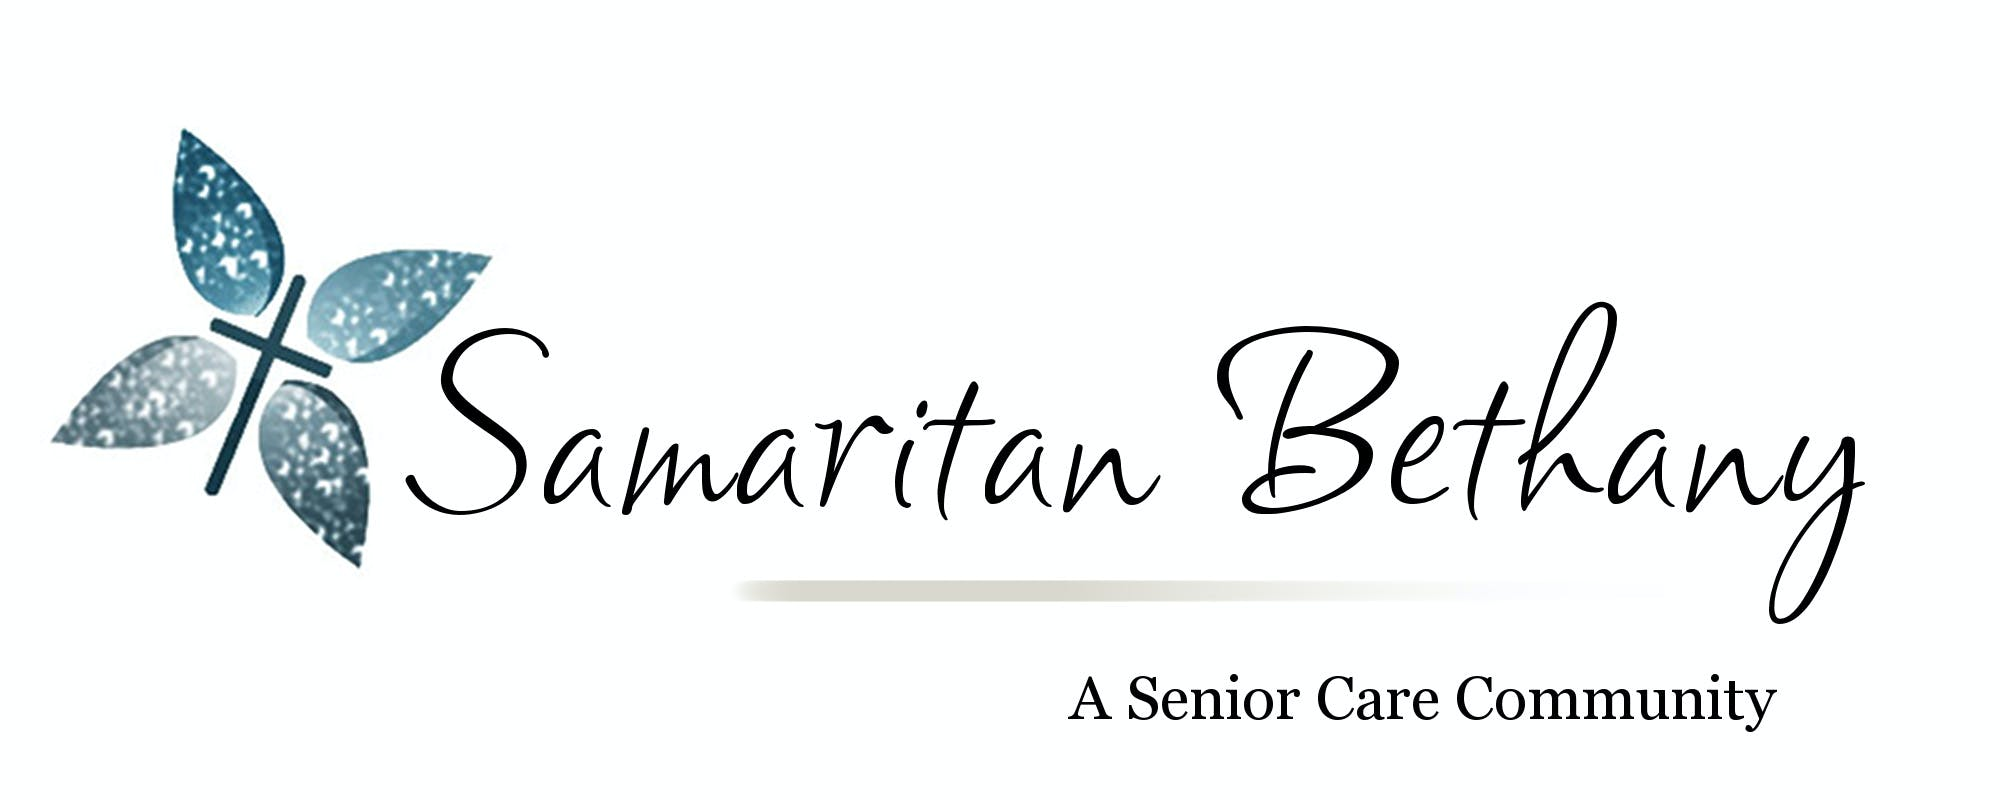 Samaritan Bethany Senior Care Community